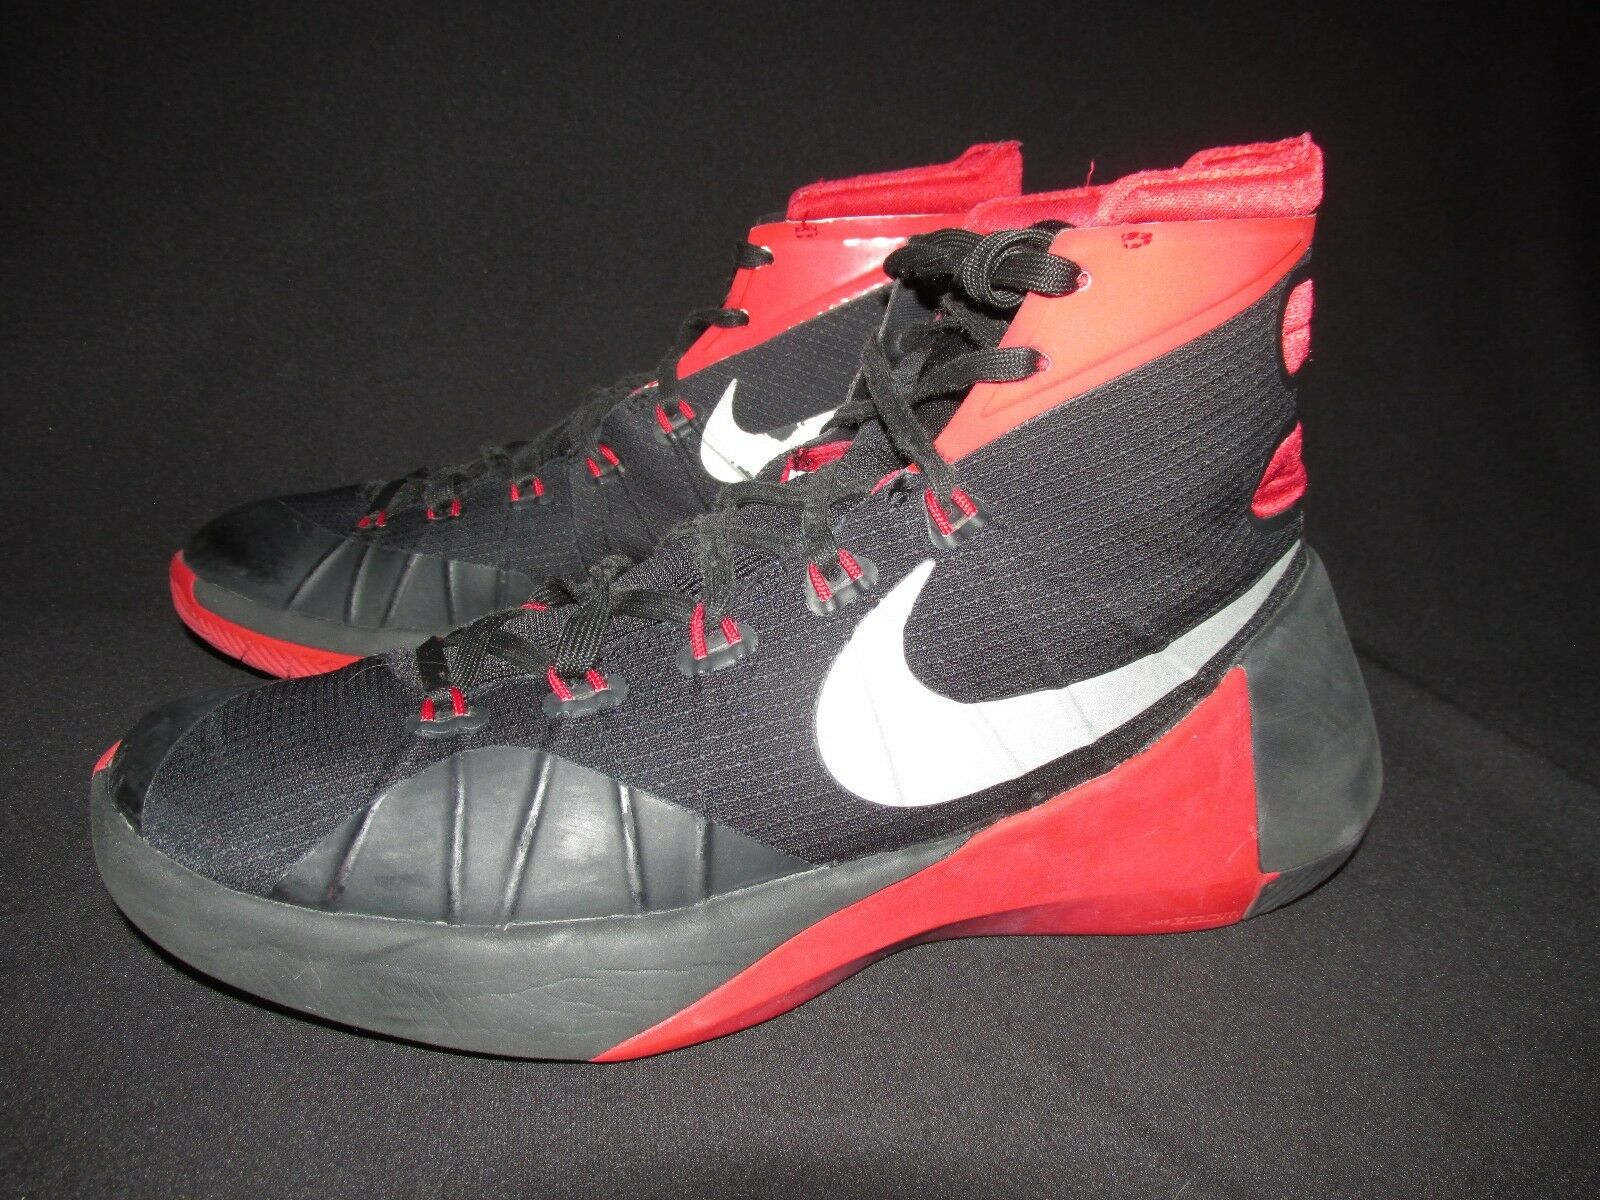 Nike HyperDunk Red Black High Top Basketball Shoes Men's US 8.5M Seasonal price cuts, discount benefits